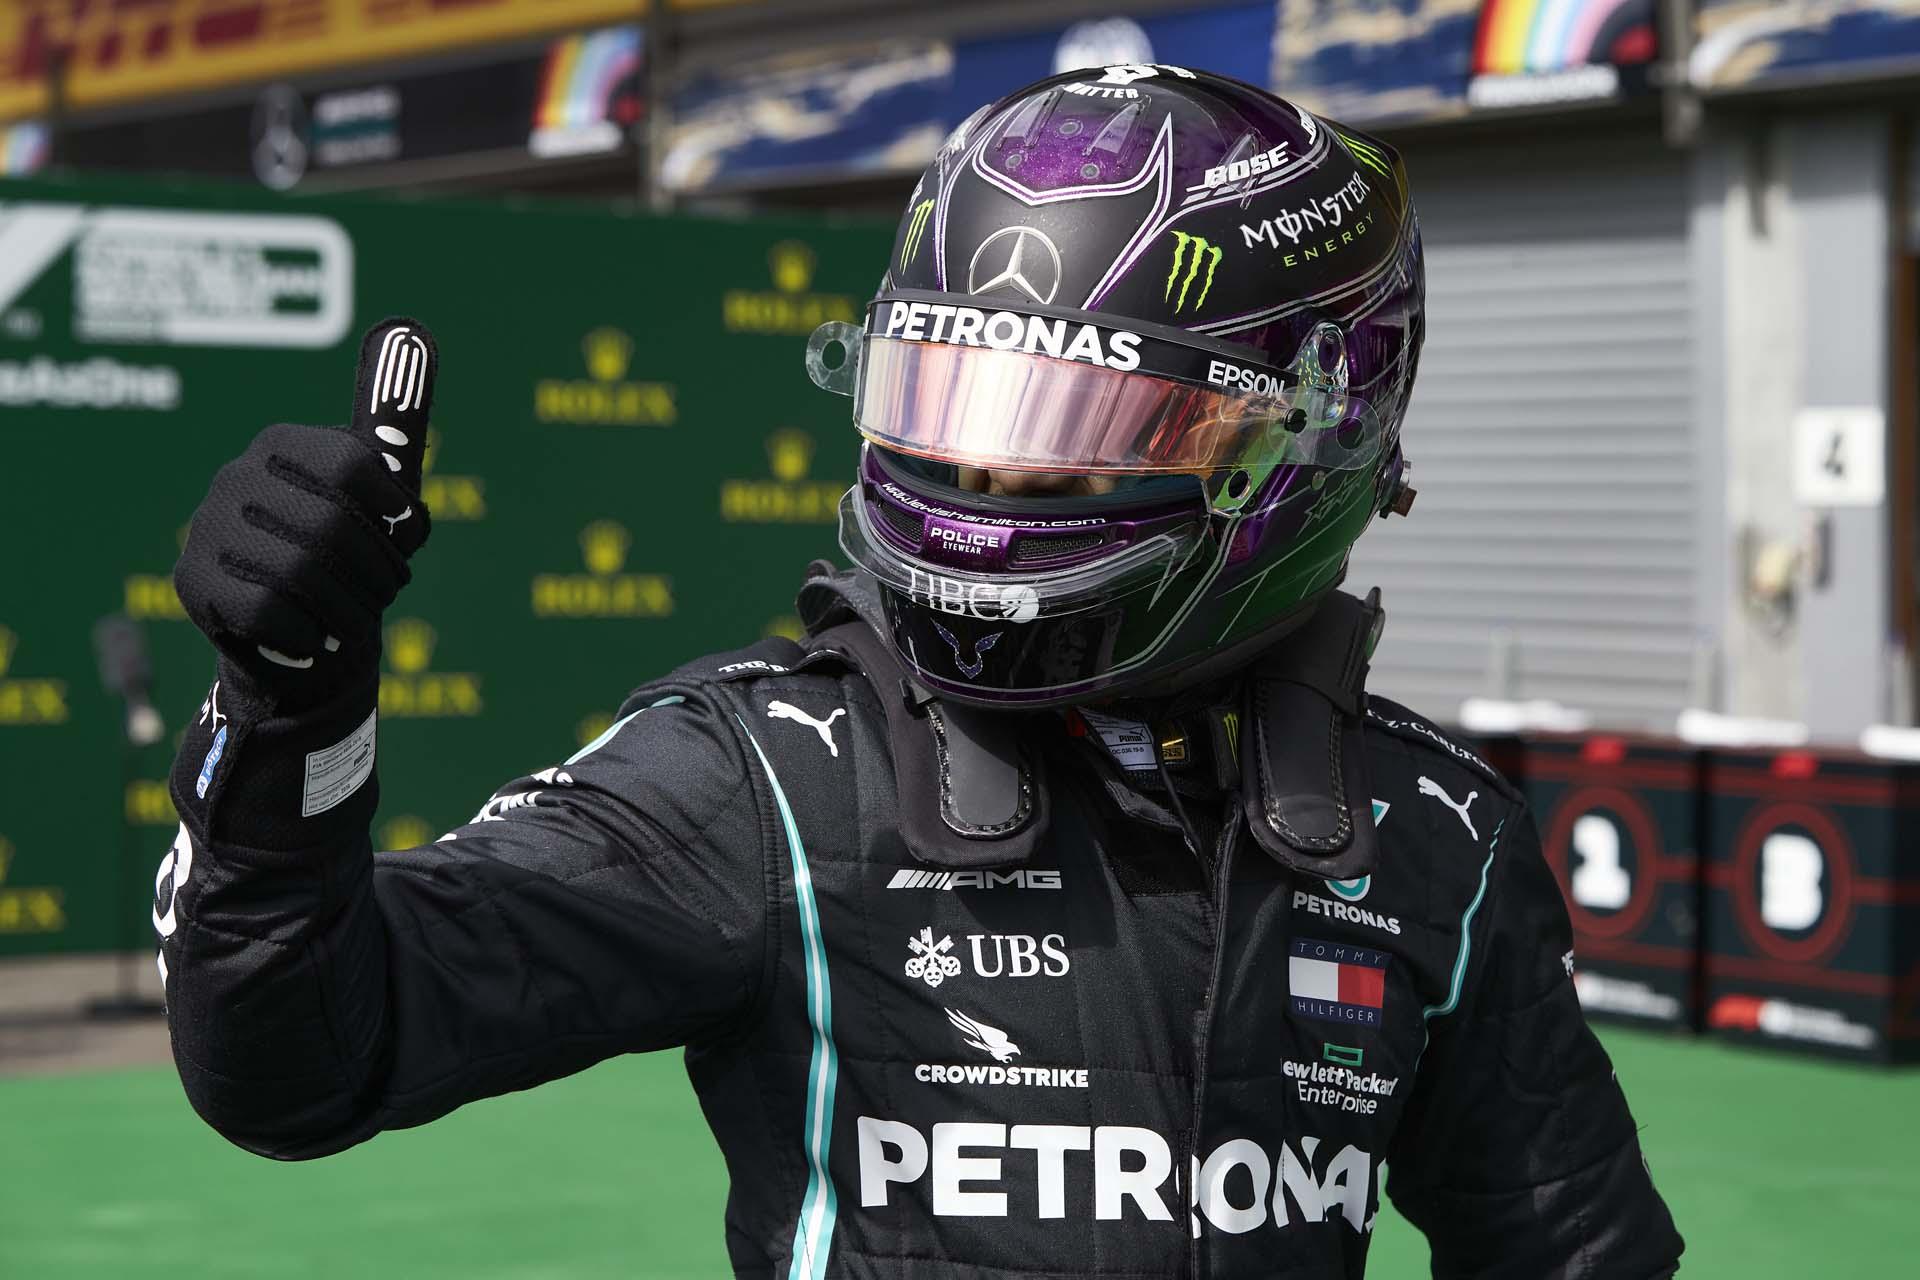 2020 Belgian Grand Prix, Saturday - Steve Etherington